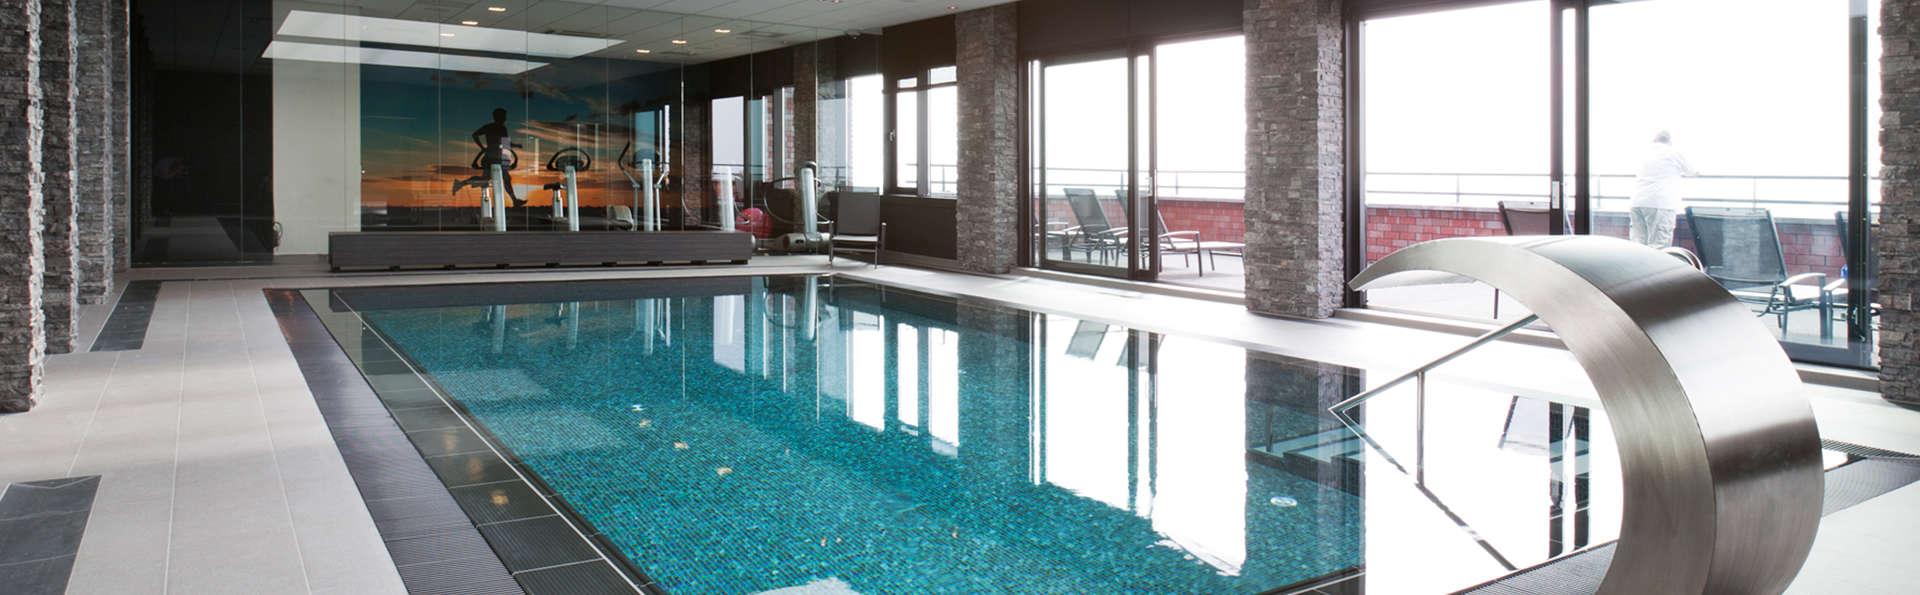 Van der Valk hotel Dordrecht - edit_Wellness__01__-_Copy.jpg